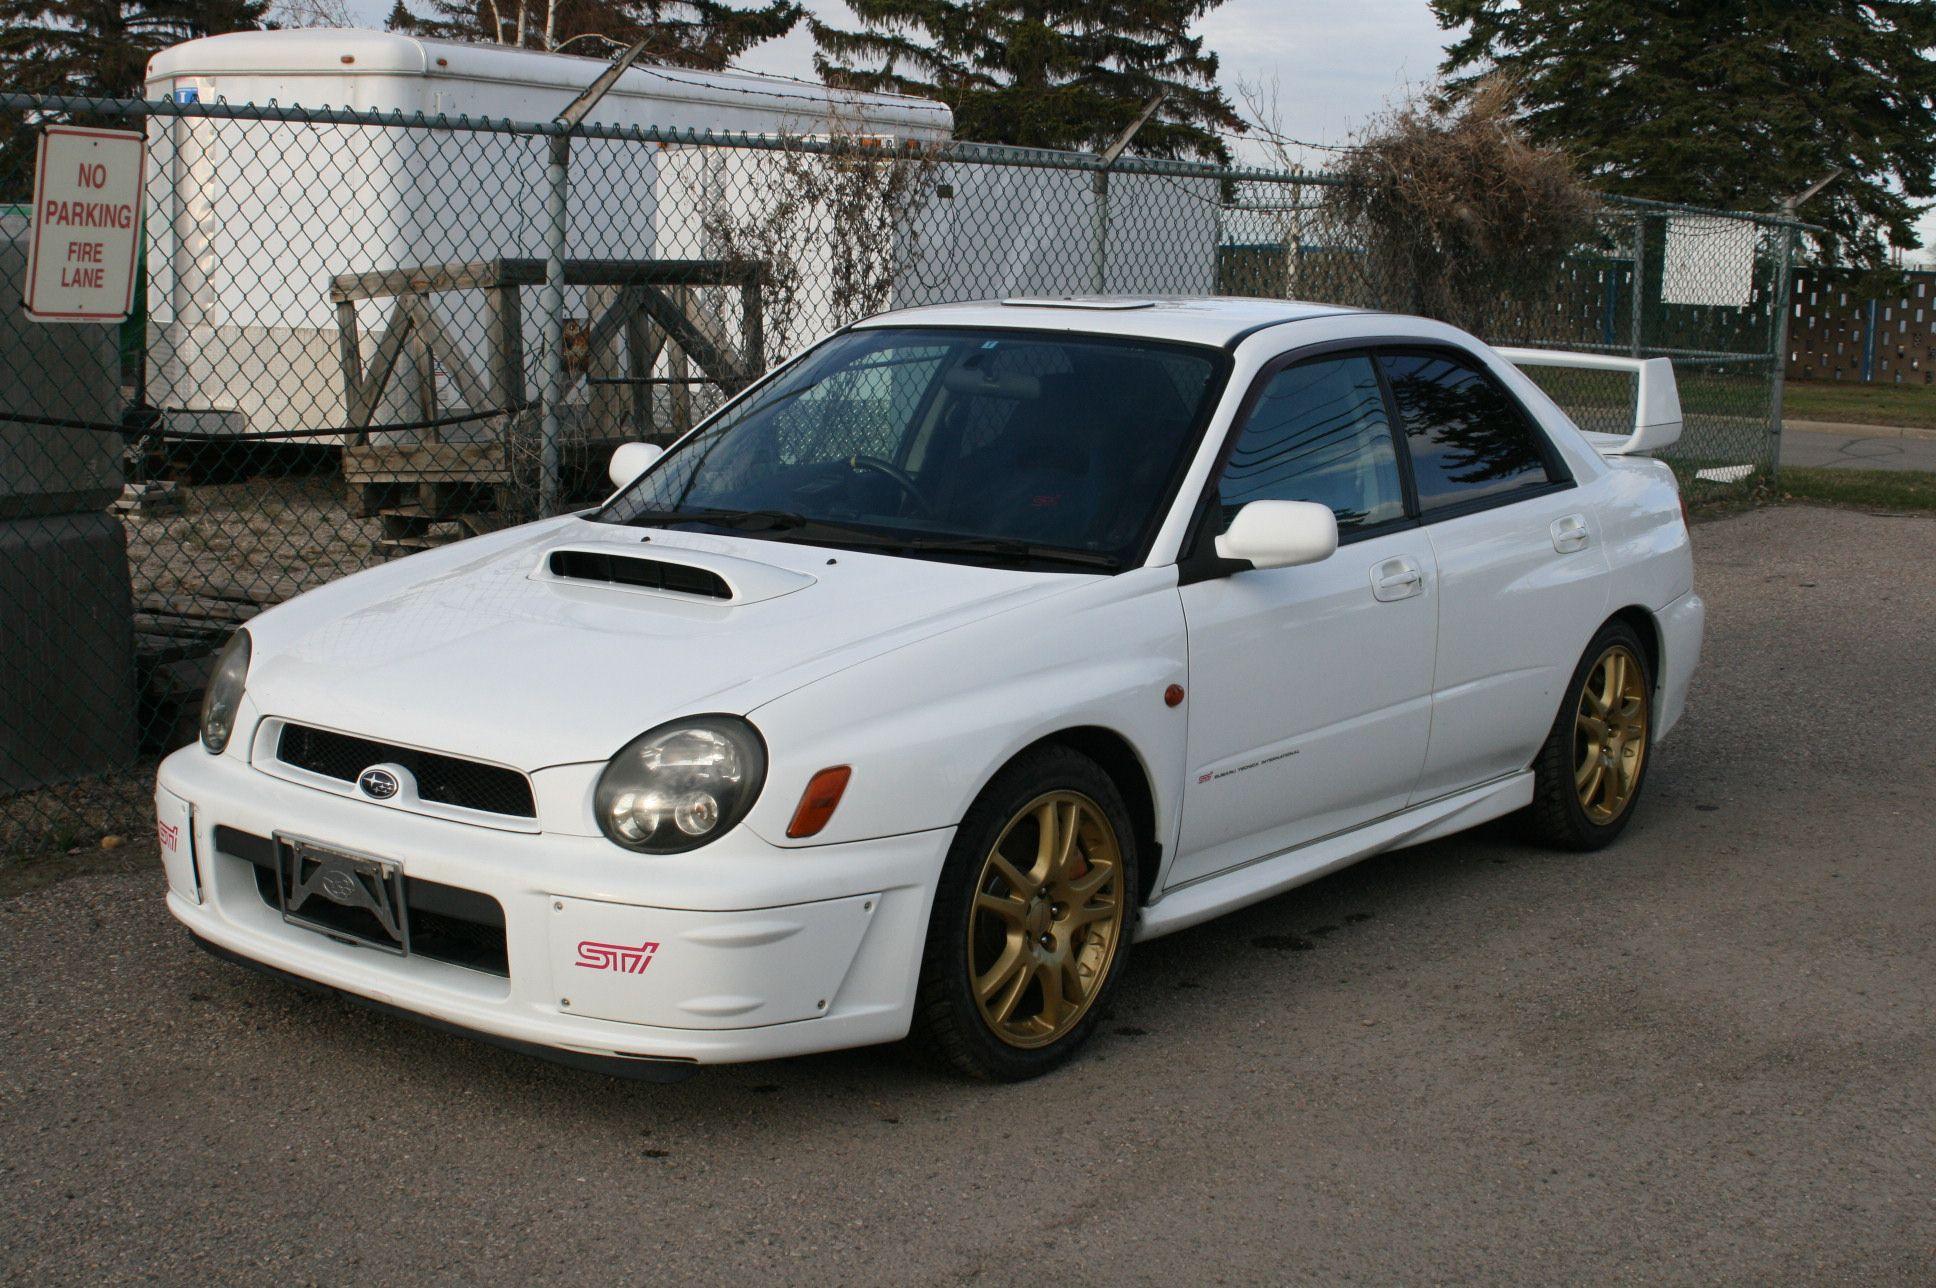 Jdm 2001 Subaru Wrx Sti V 7 Prodrive Jdm Jdmtuners Prodrive Canada Forsale Rally Rare Ej207 Subaru Wrx Sti Subaru Wrx Sti